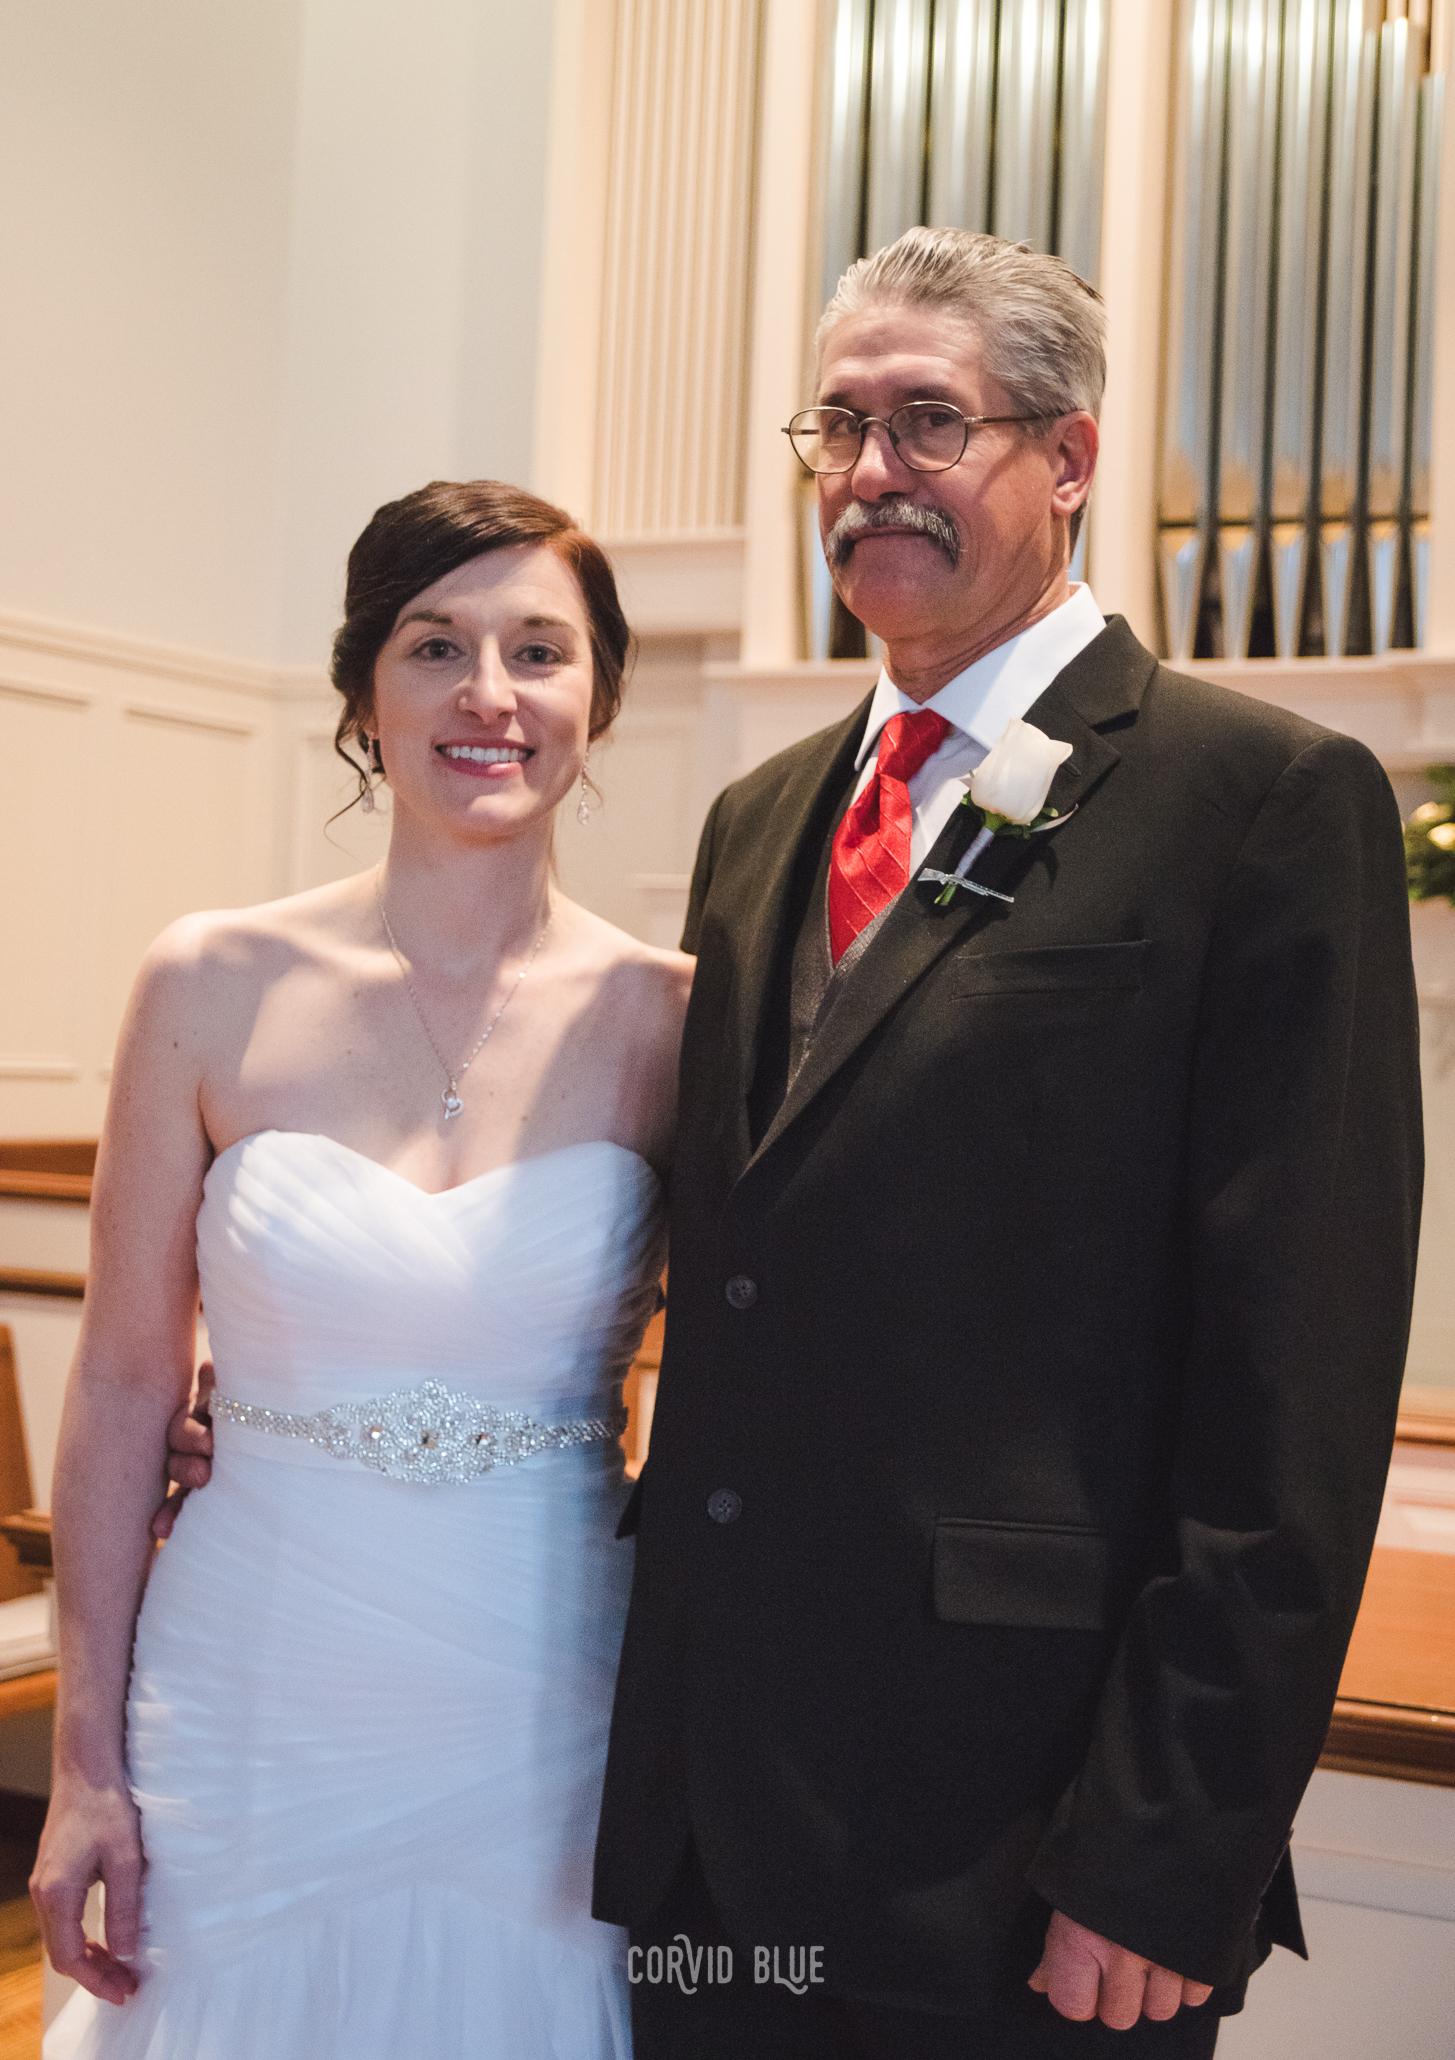 Kirk wedding-417.jpg